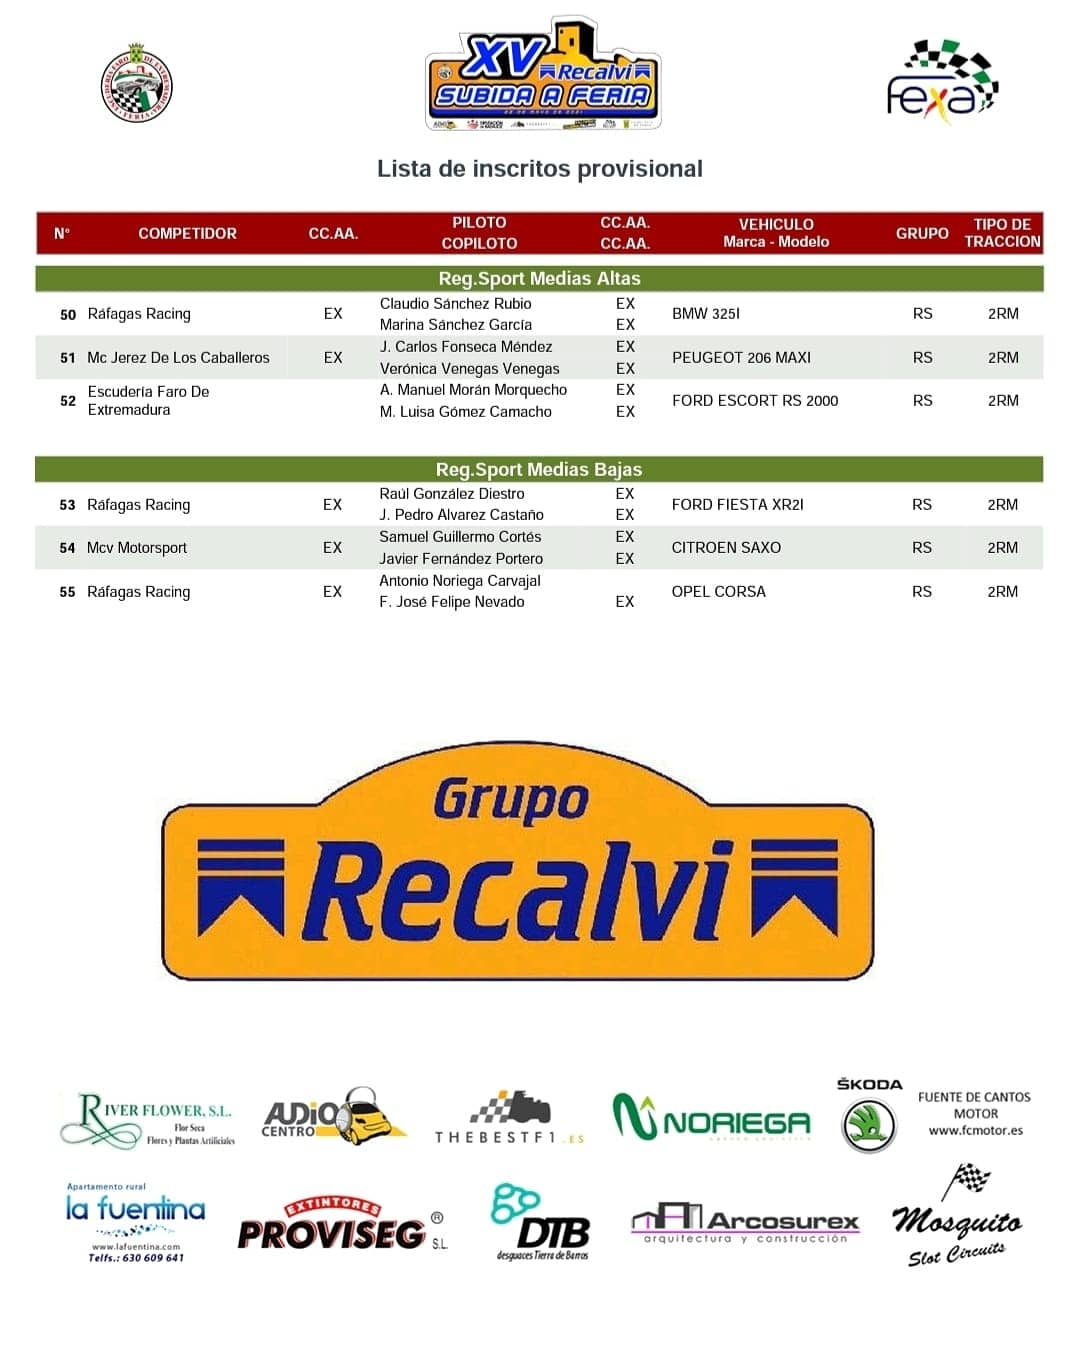 Campeonatos de Montaña Nacionales e Internacionales (FIA European Hillclimb, Berg Cup, BHC, CIVM, CFM...) - Página 43 E10TpVYXoAELObD?format=jpg&name=large